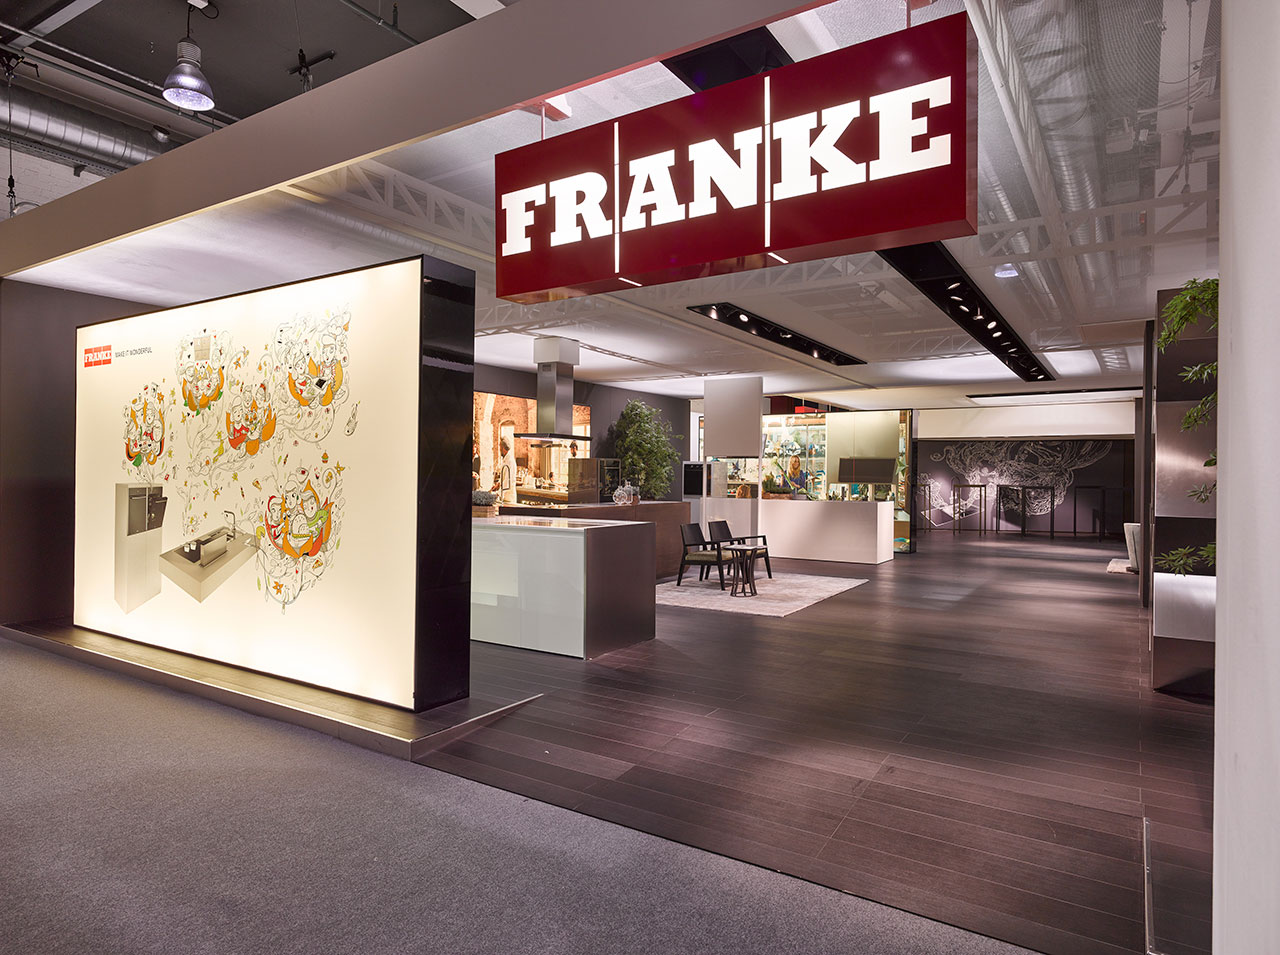 2-Franke-Swissbau-2016-Basilea